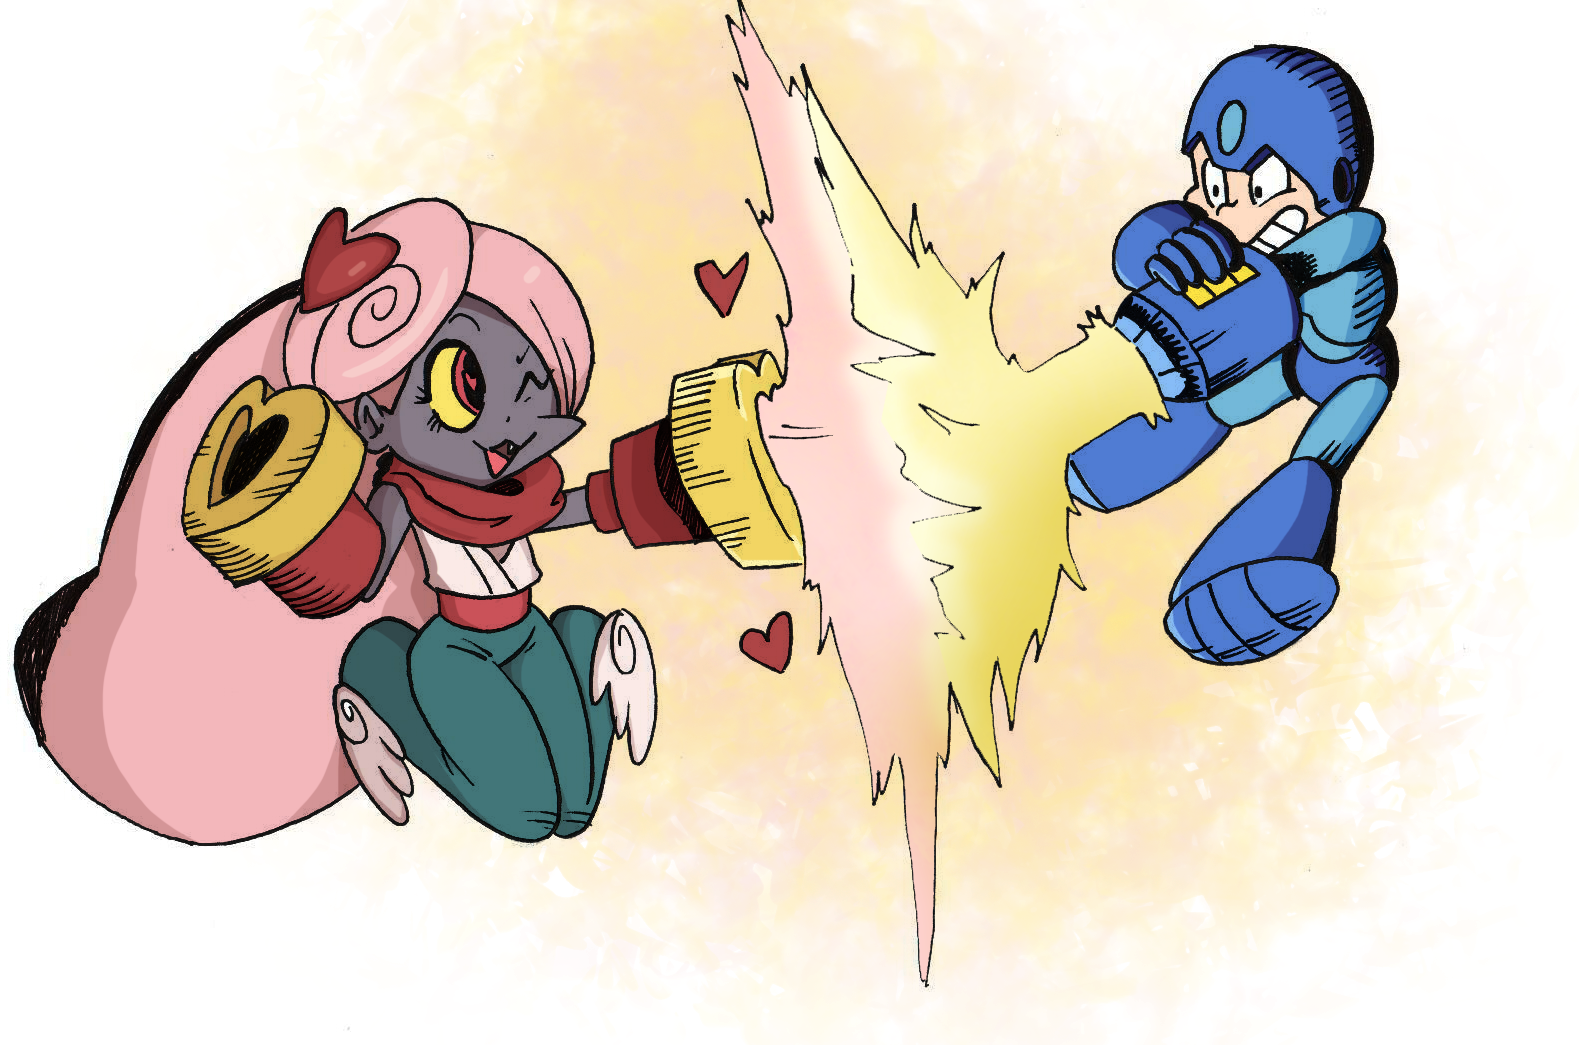 Casanuva+Casanono versus Megaman